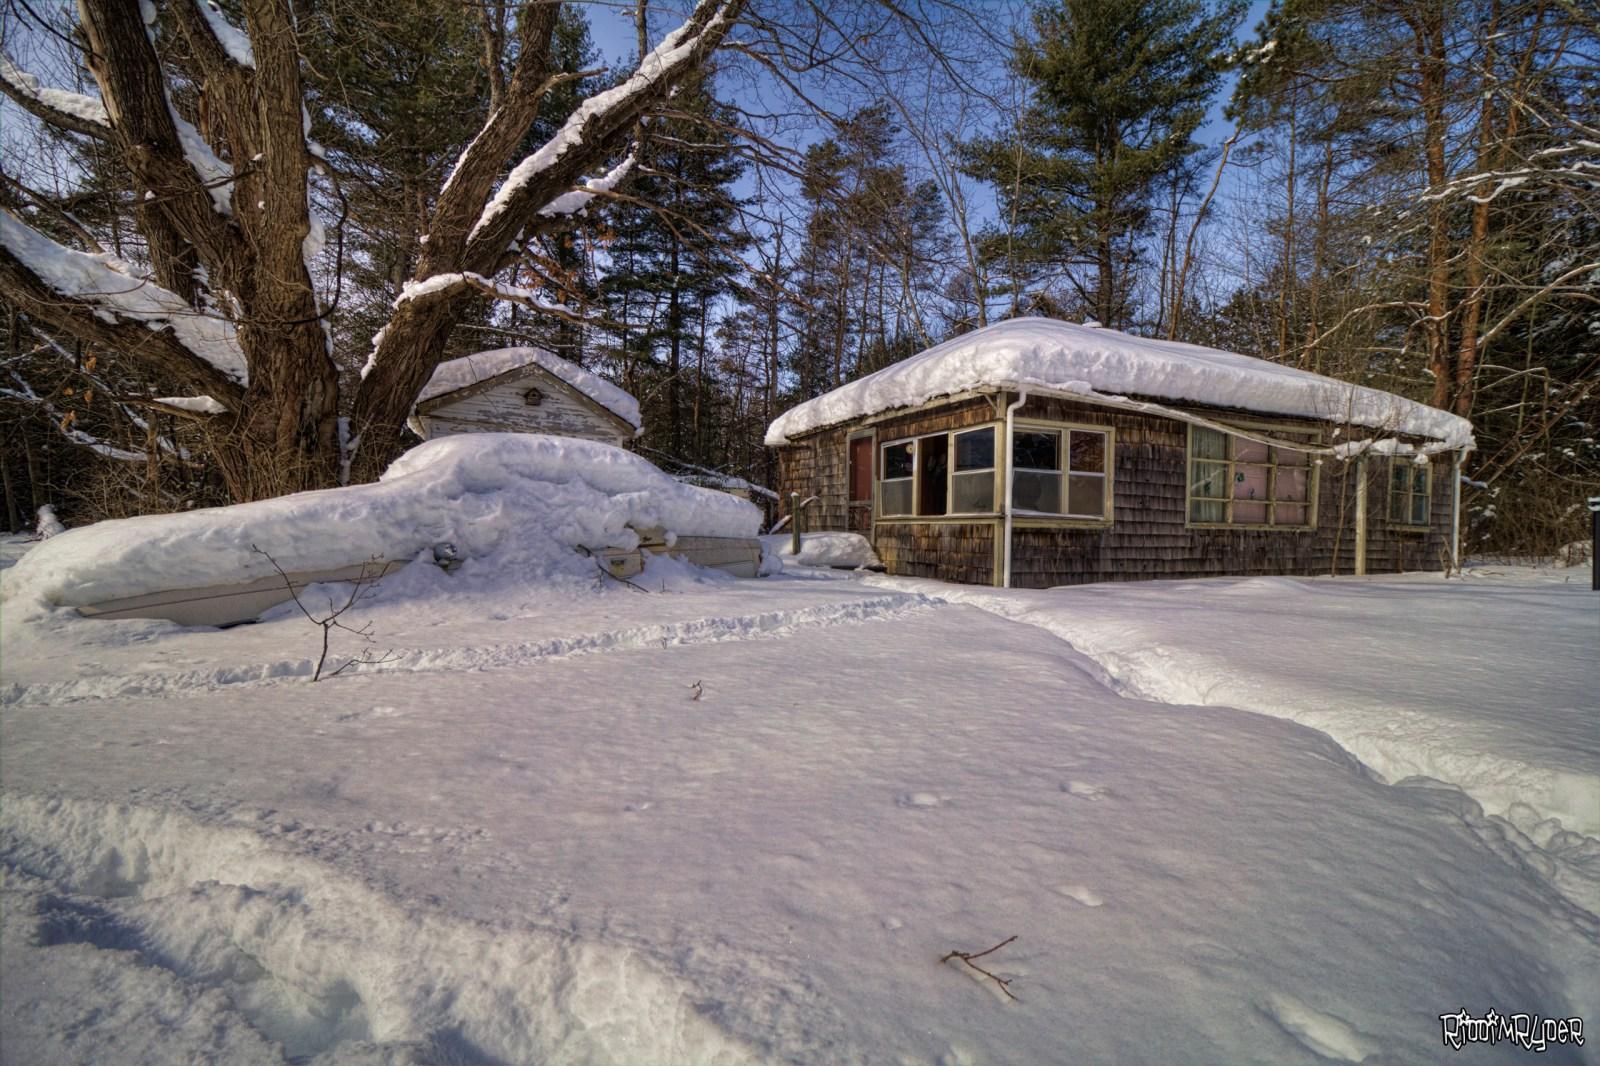 Grandpas Abandoned Cabin